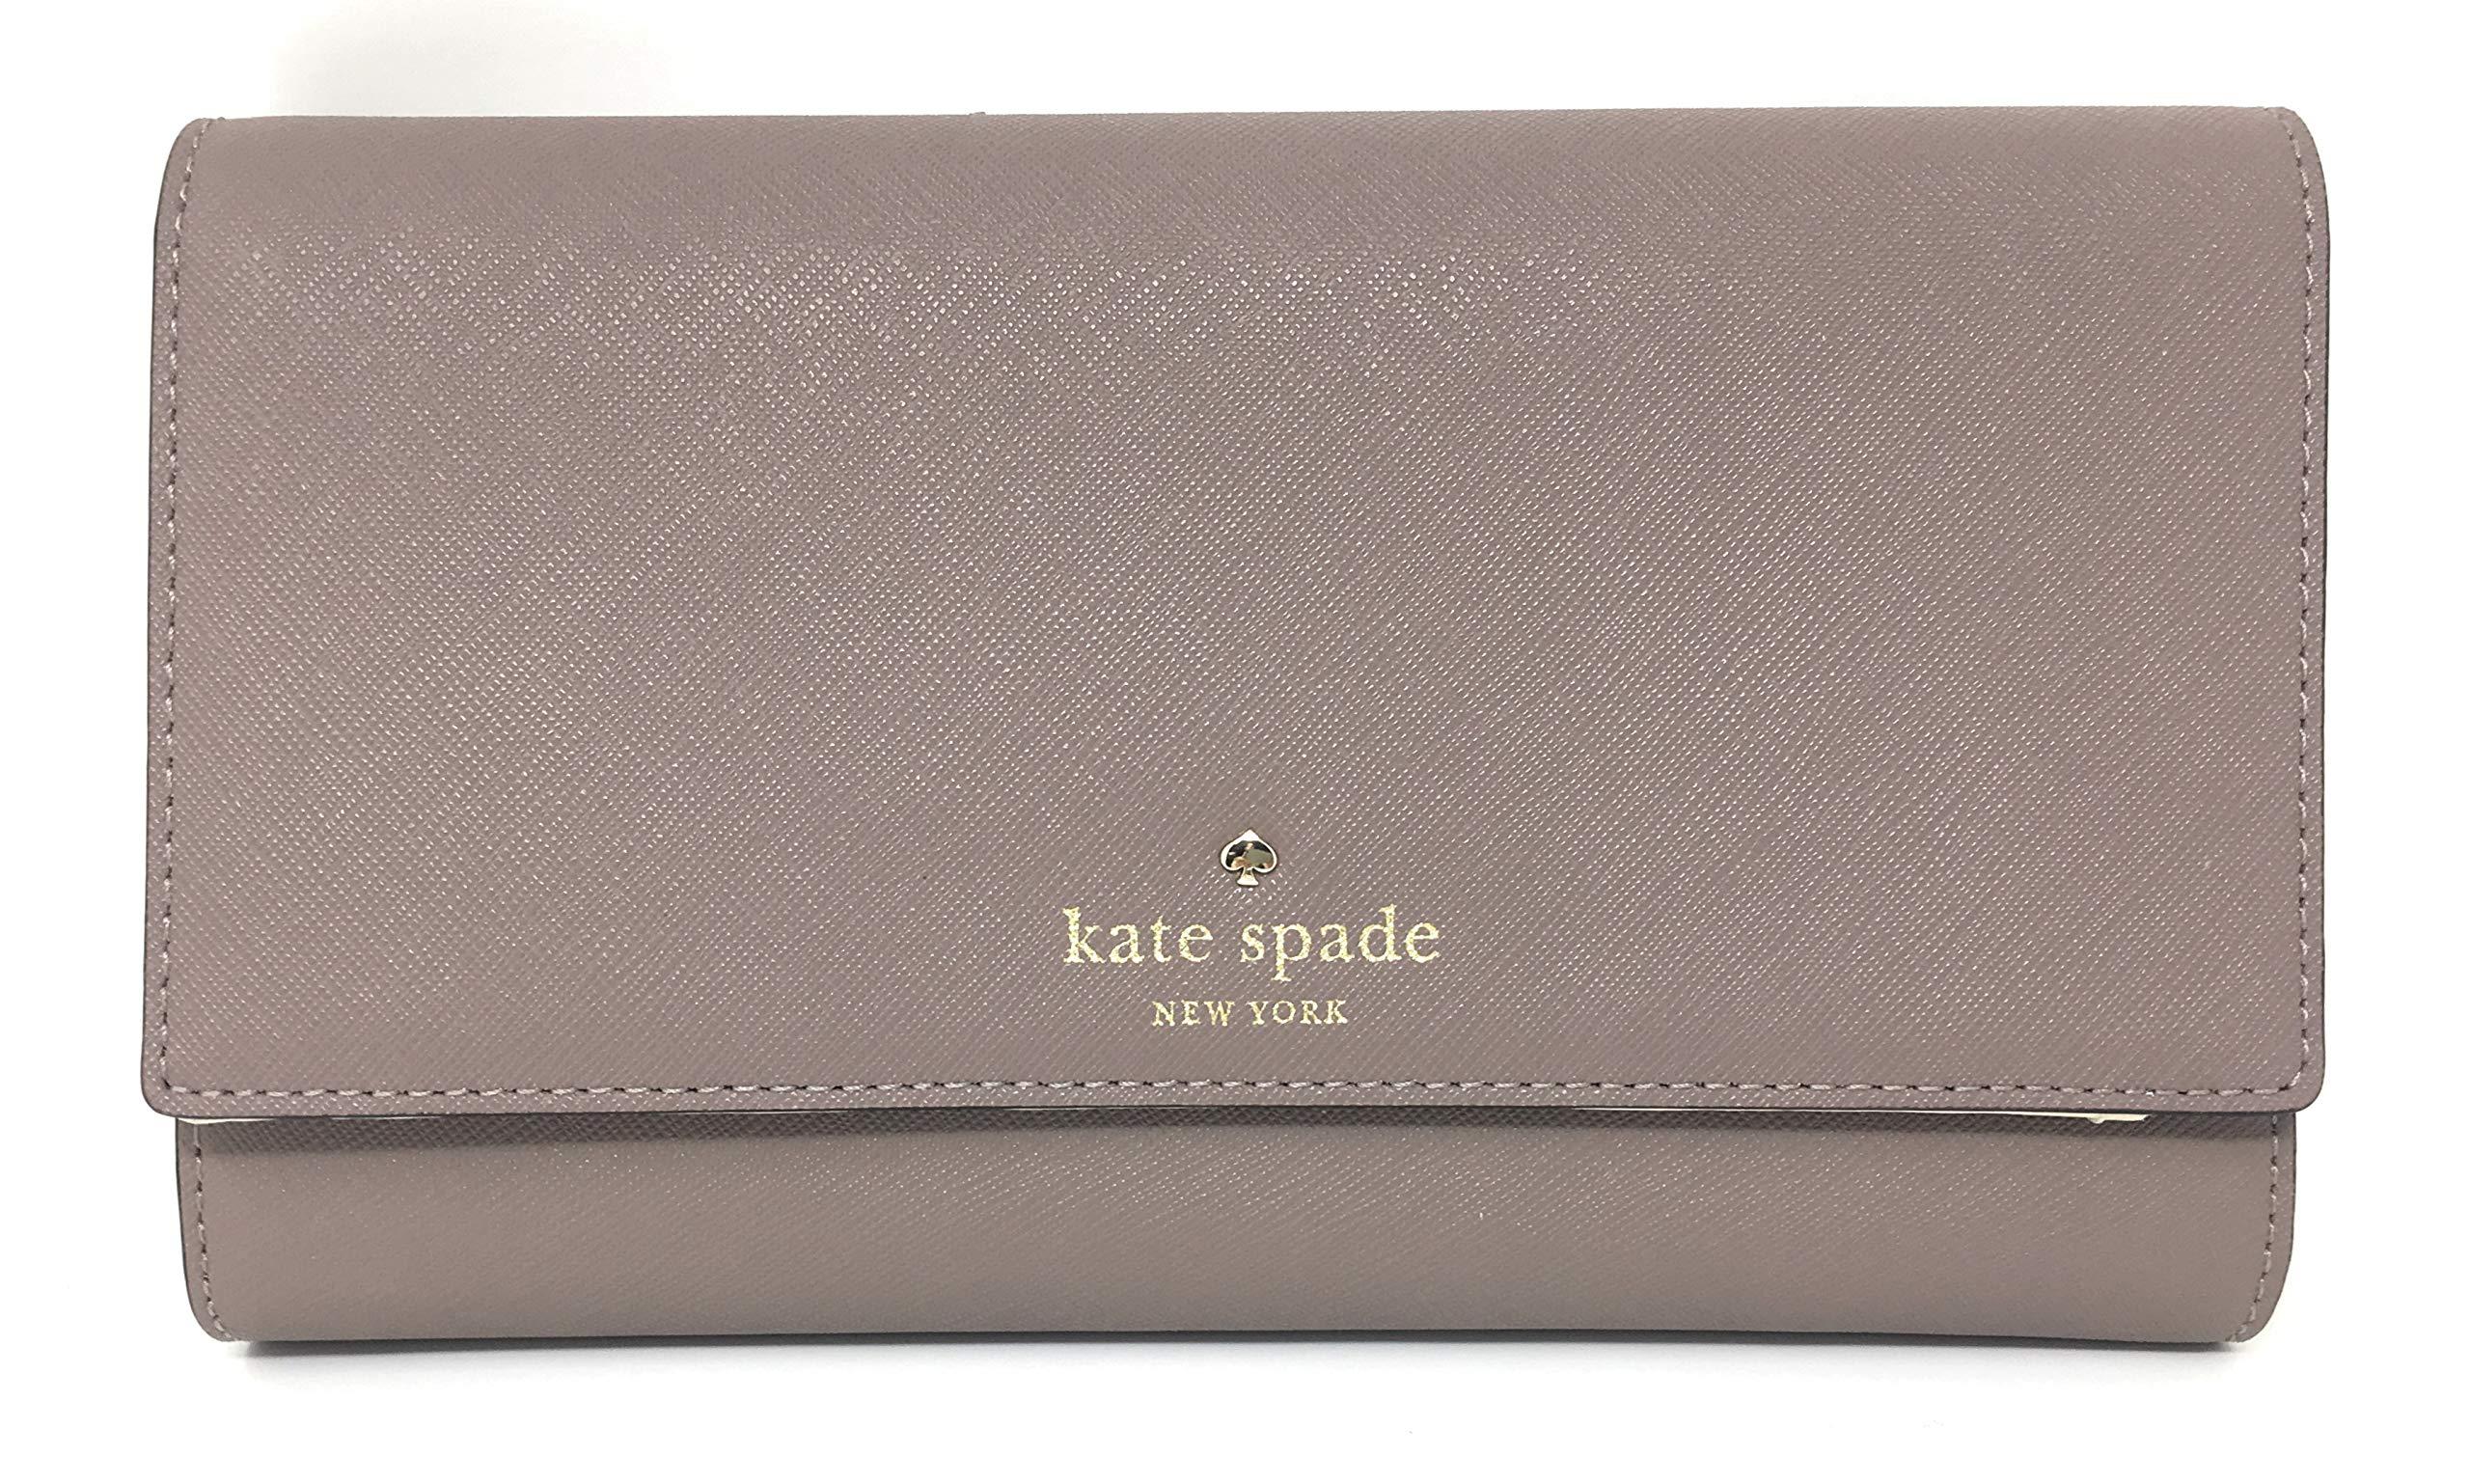 Kate Spade New York Mikas Pond Phoenix Large Leather Travel Wallet (Porcini)